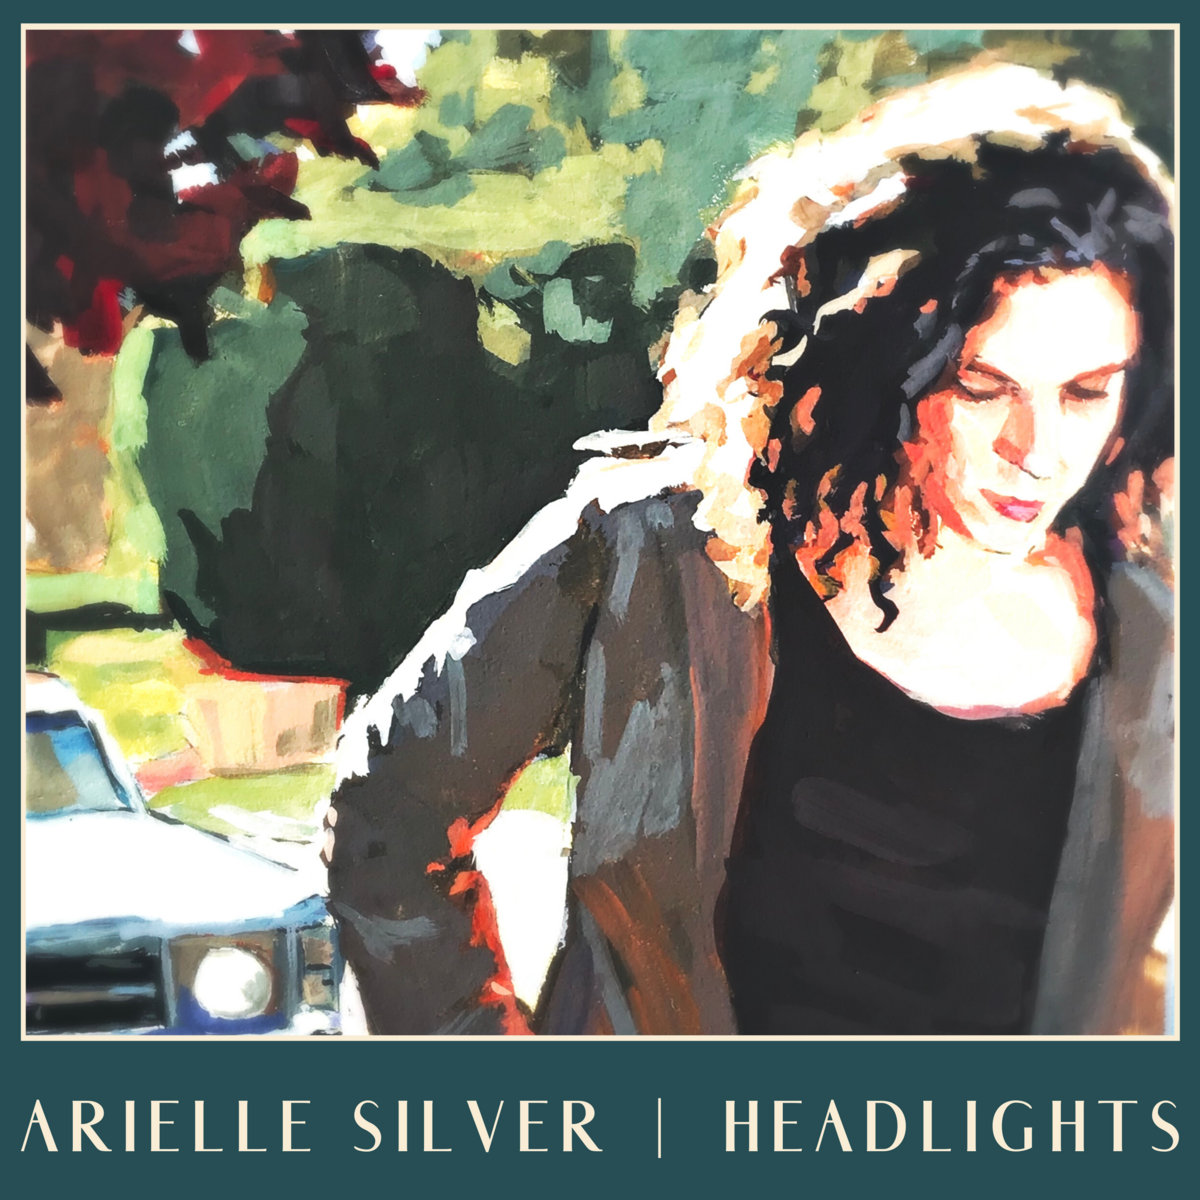 Headlights (single) by Arielle Silver